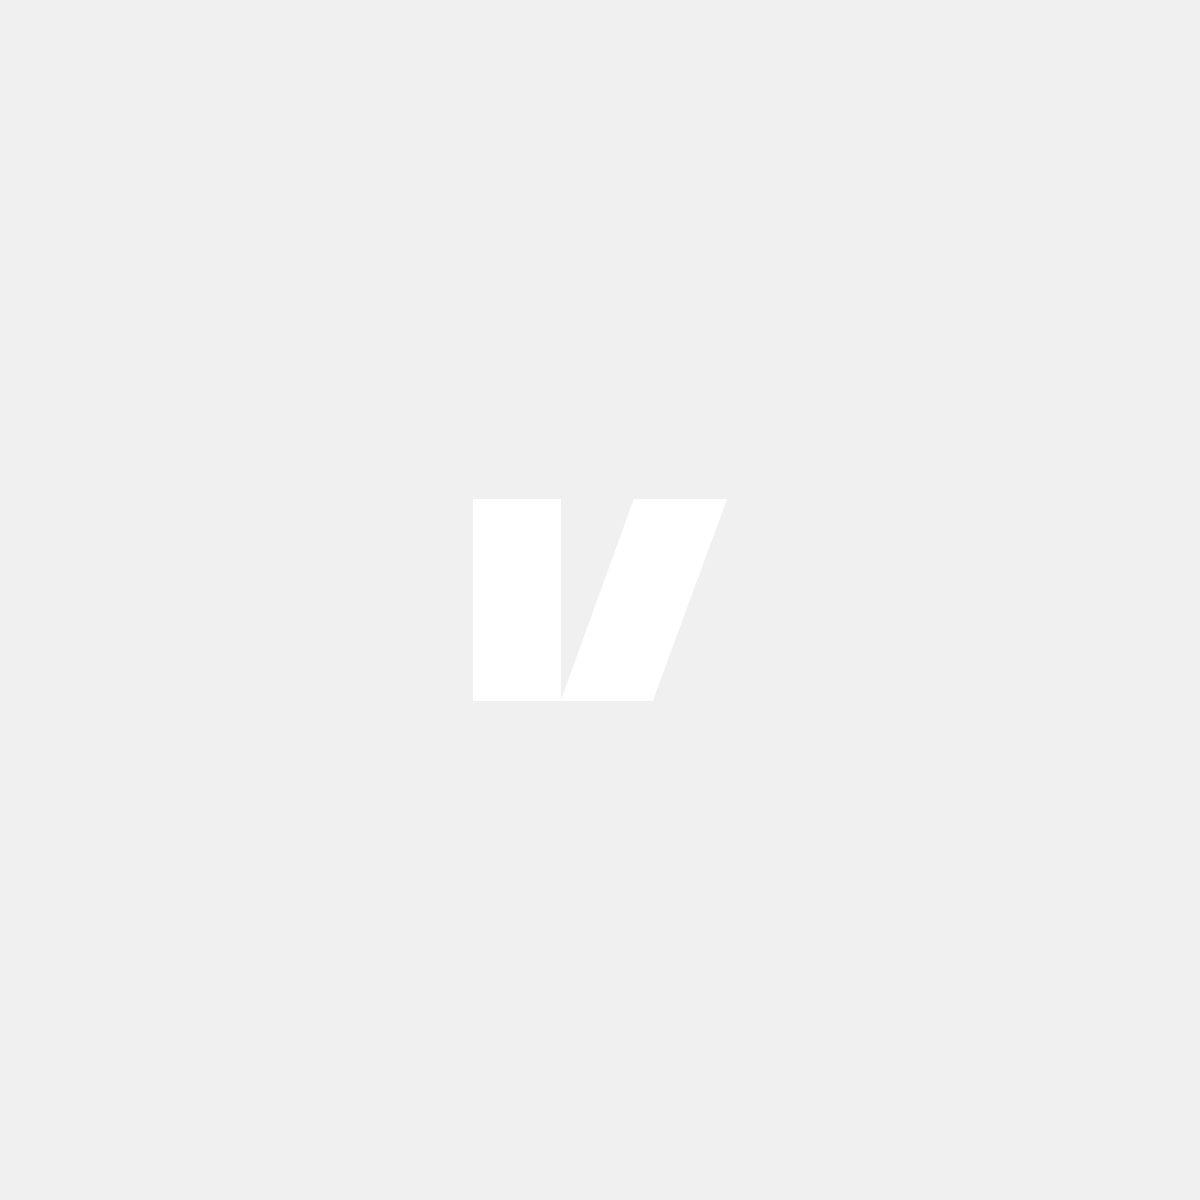 Slitsade bromsskivor fram till Volvo S70, V70, V70XC, 302mm